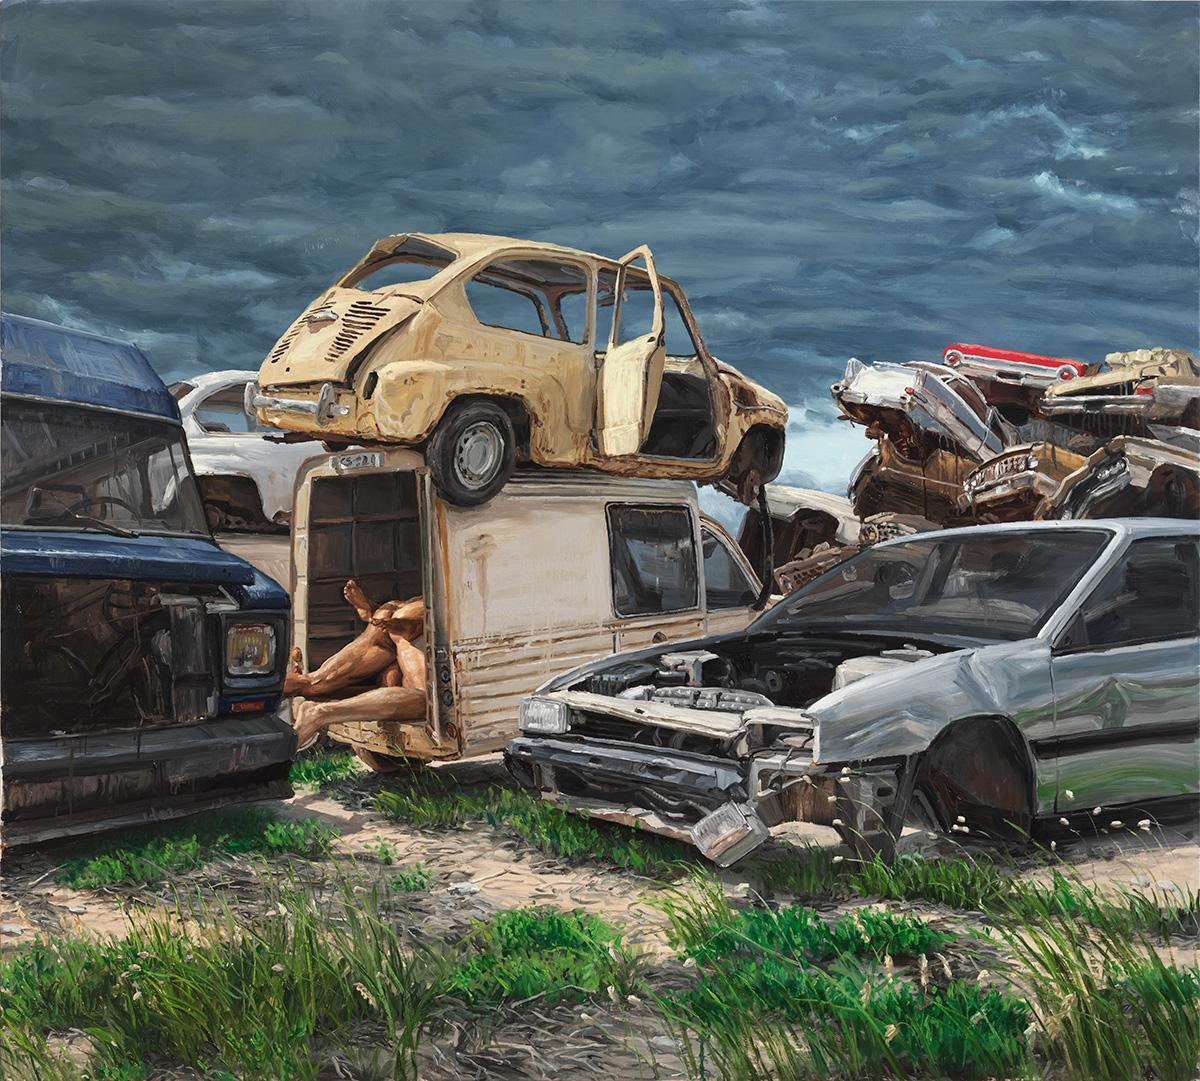 Cars Cemetery, 2011, oil on linen, 180 x 200 cm